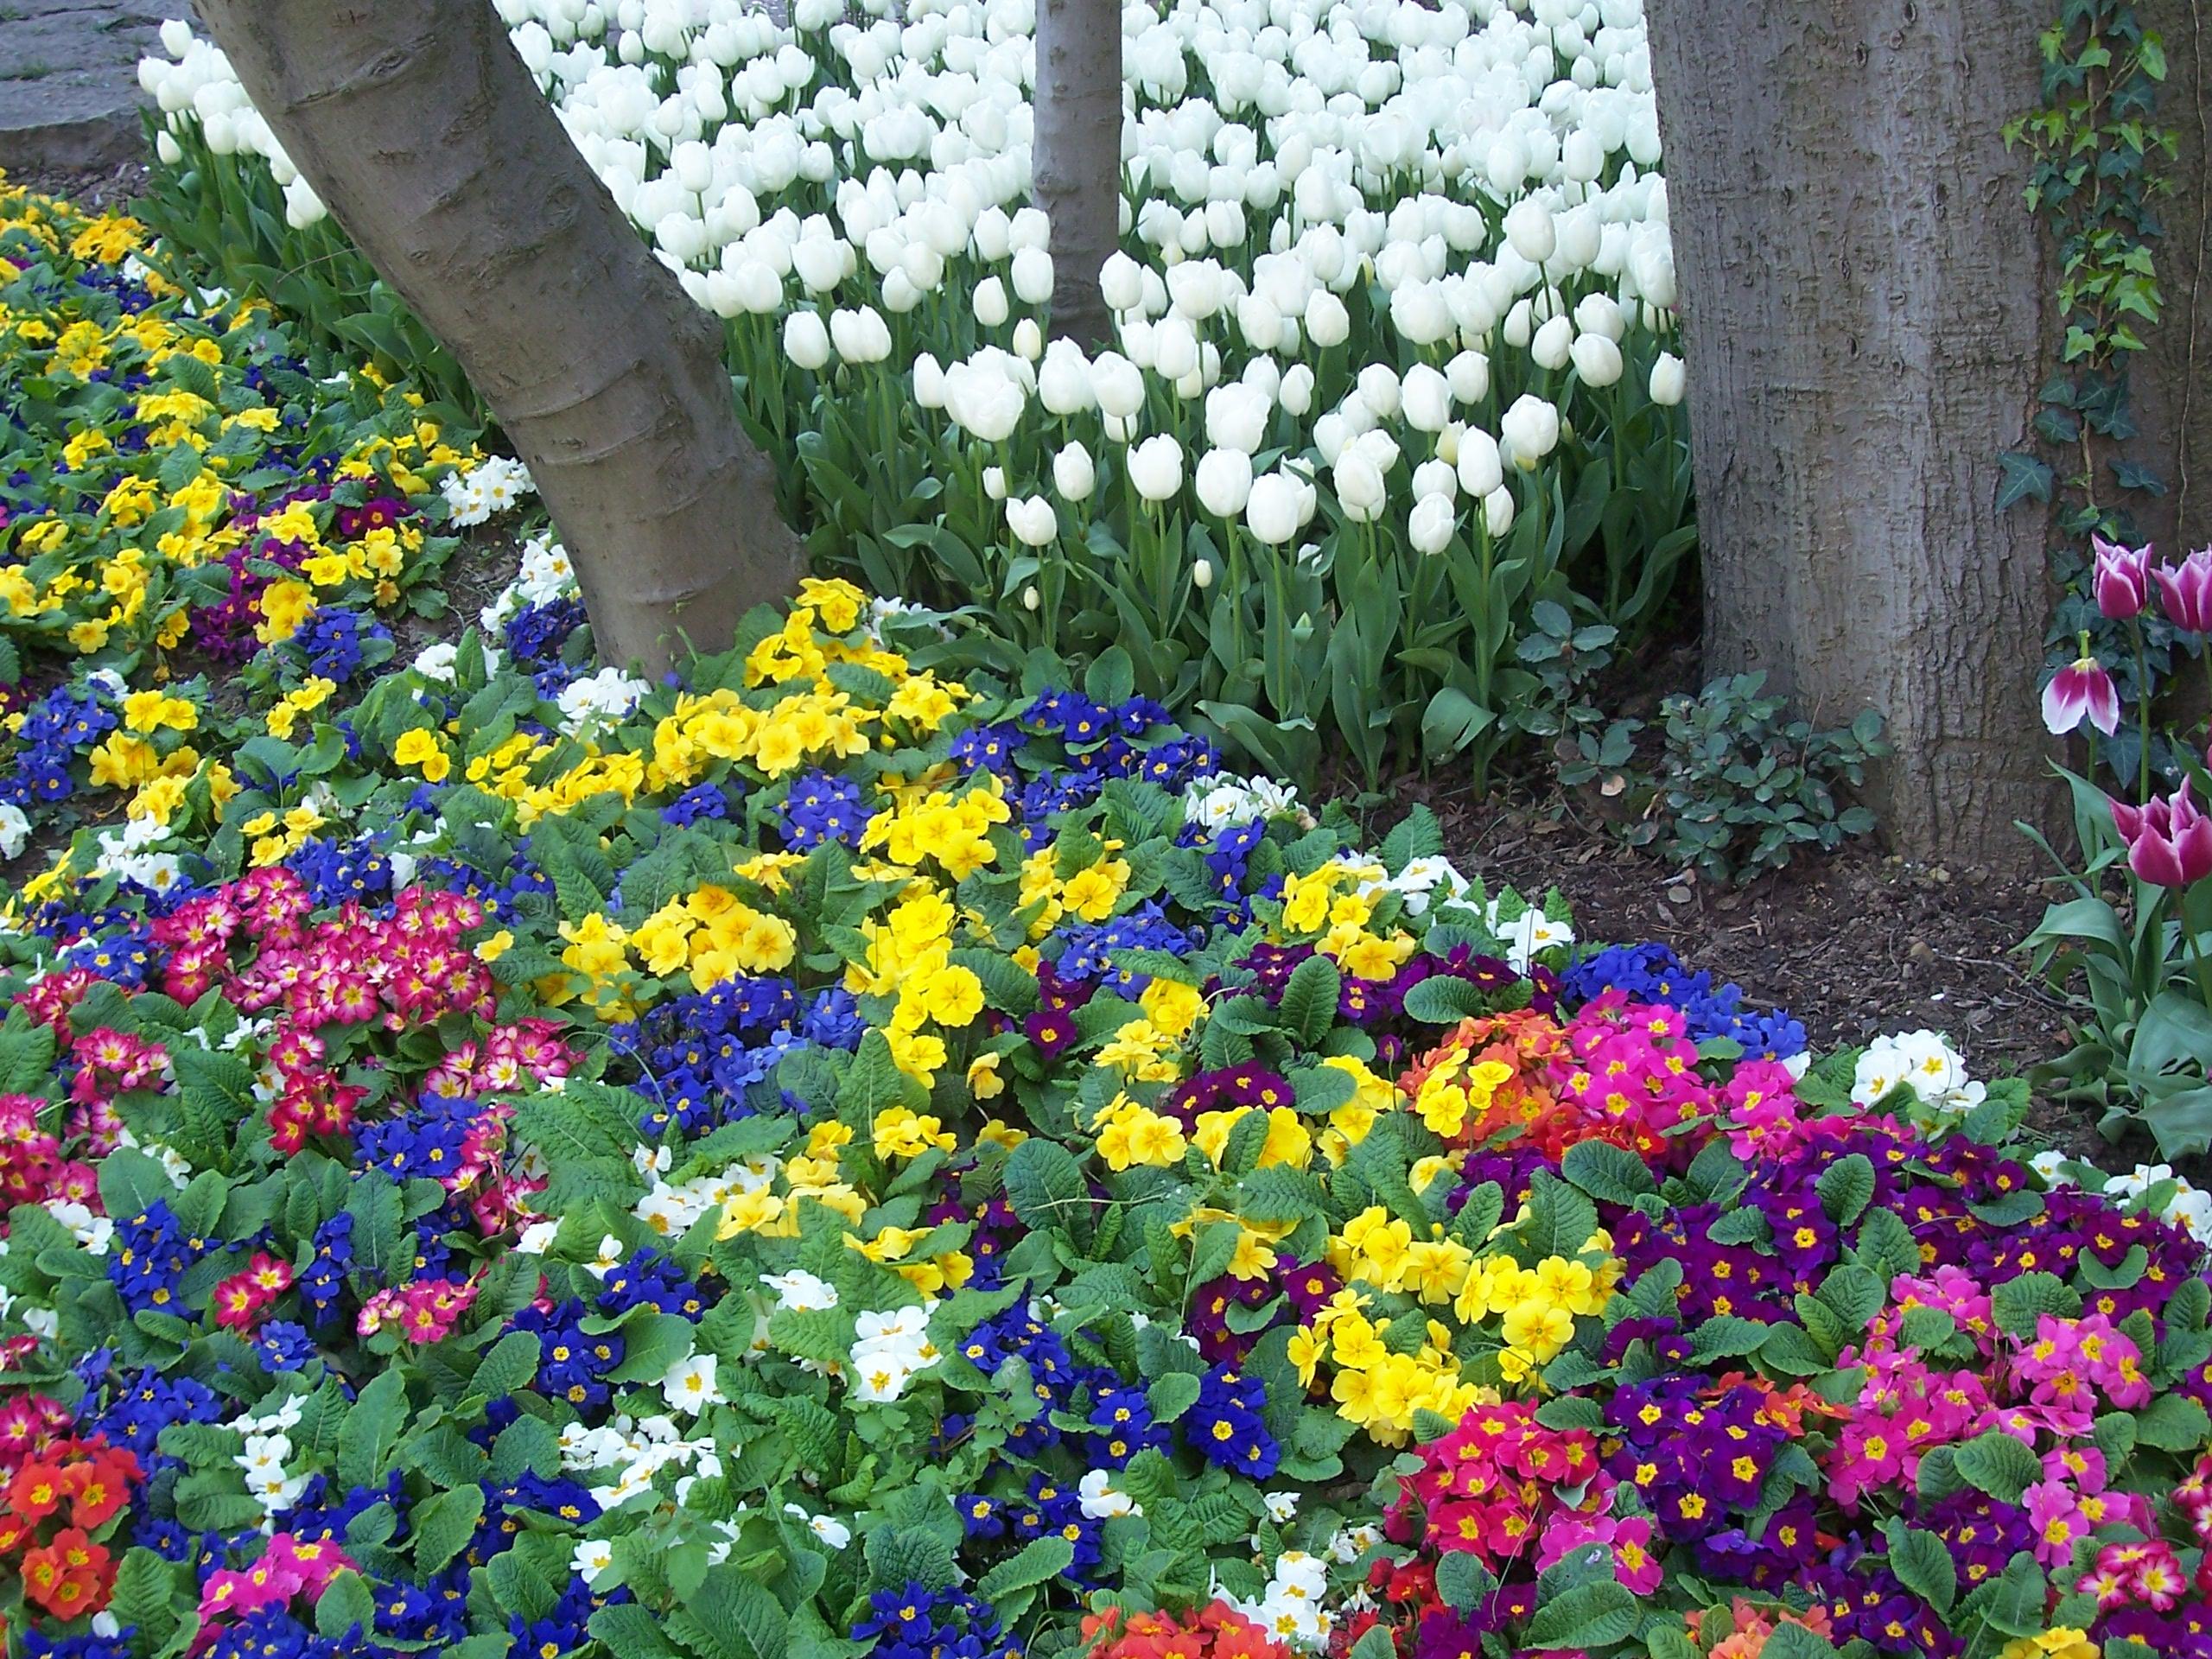 FLOWERS FLOWERS EVERYWHERE   Spring Wallpaper 37259300 2560x1920